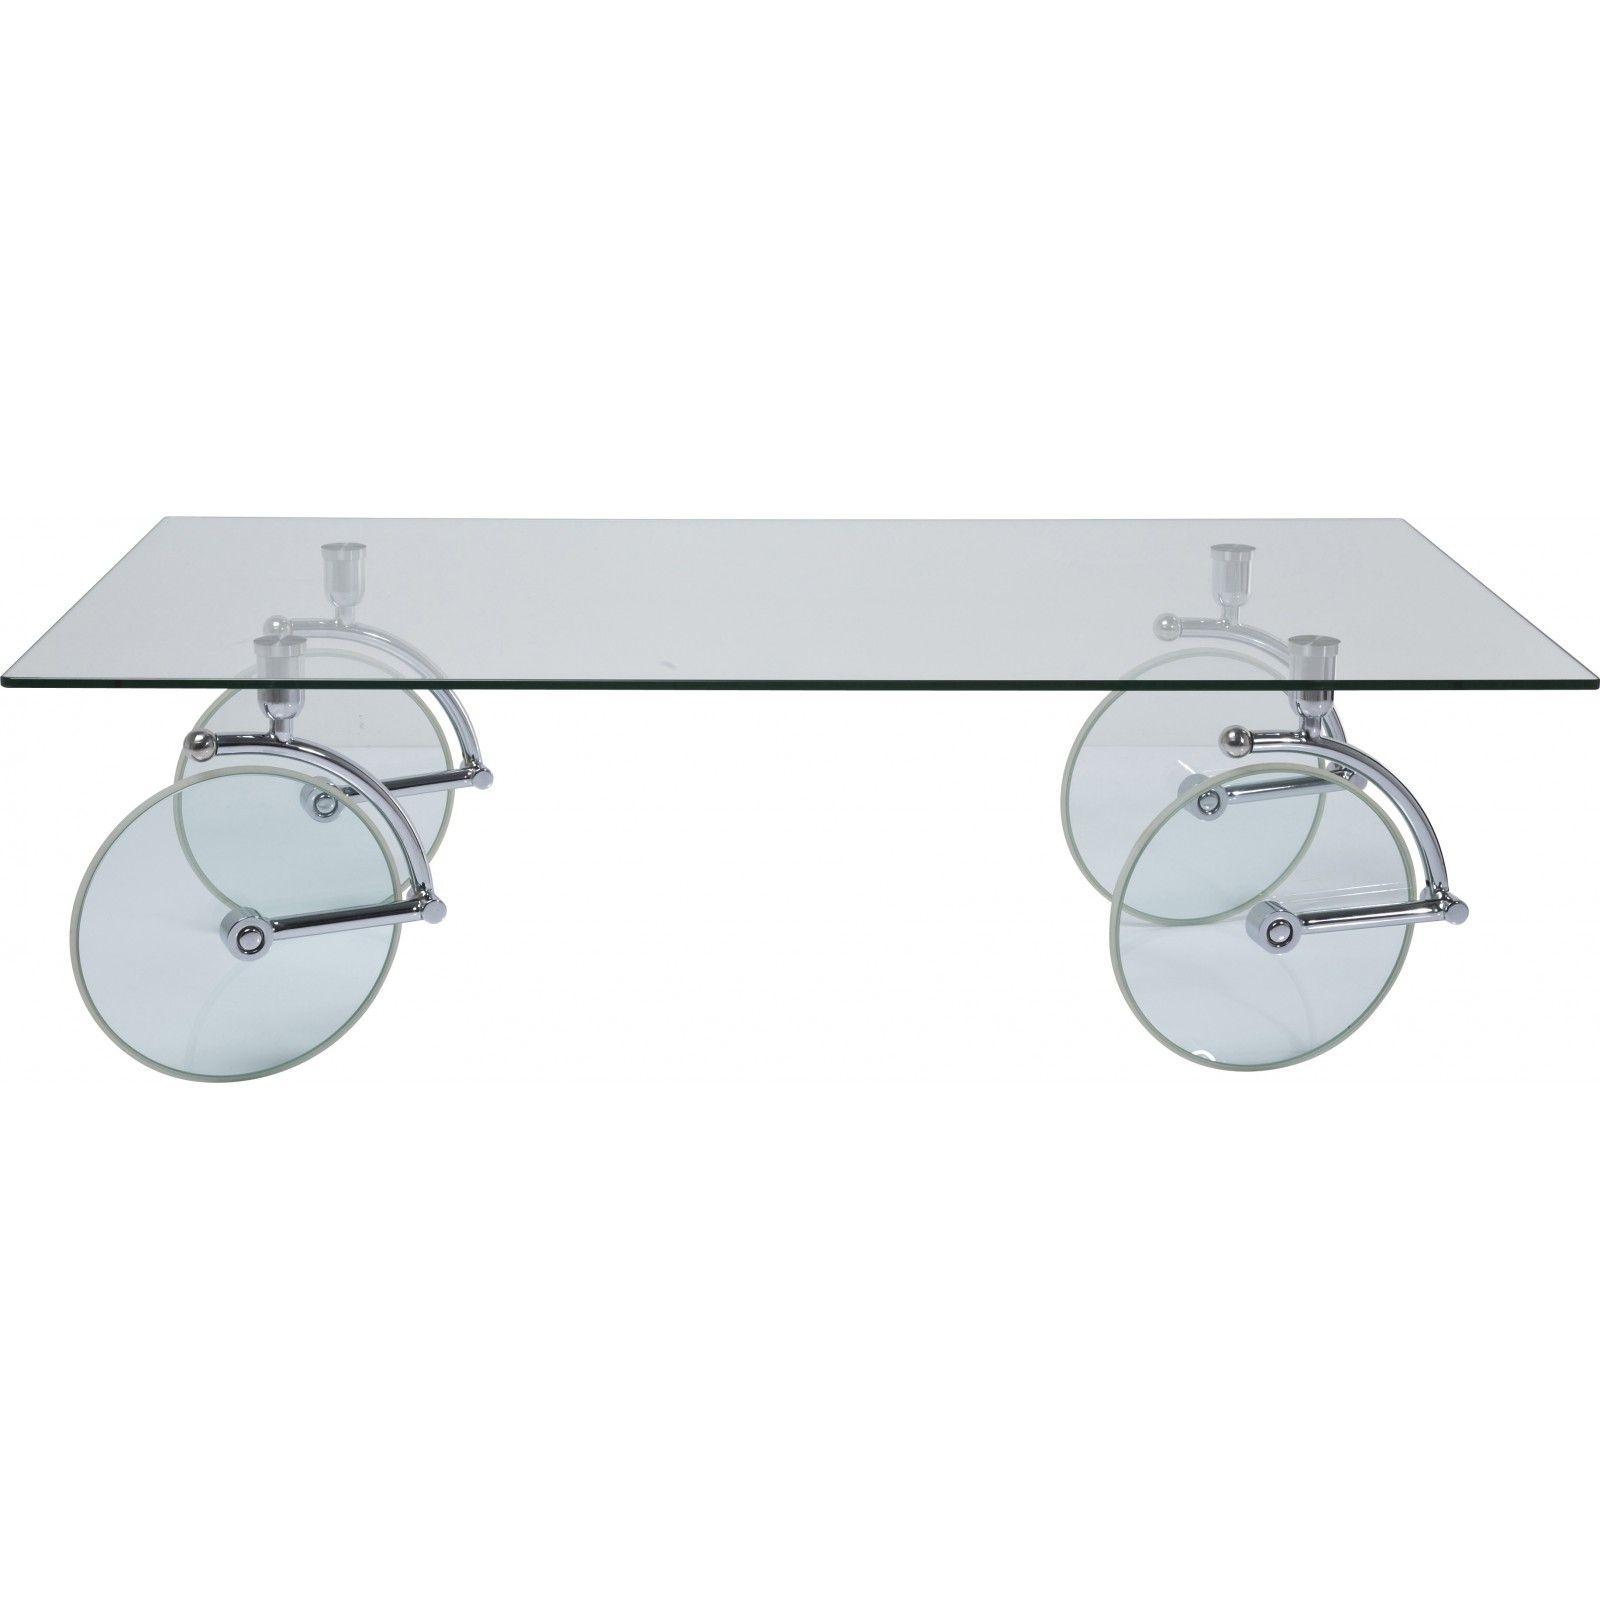 356eb97b73ba5b03ae900e7a7da7af05 Impressionnant De Table Basse Salon Design Schème